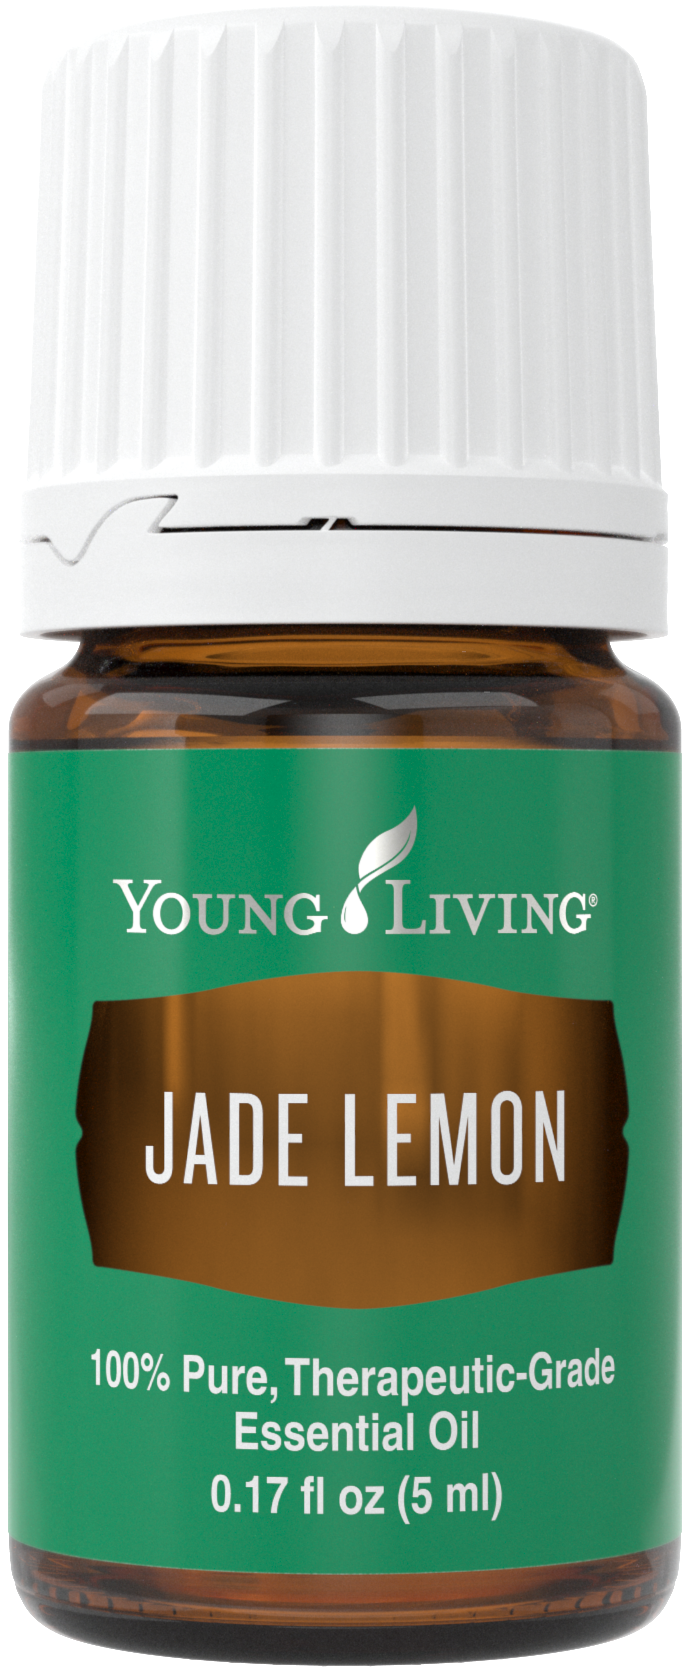 Jade Lemon 100% pure essential oil